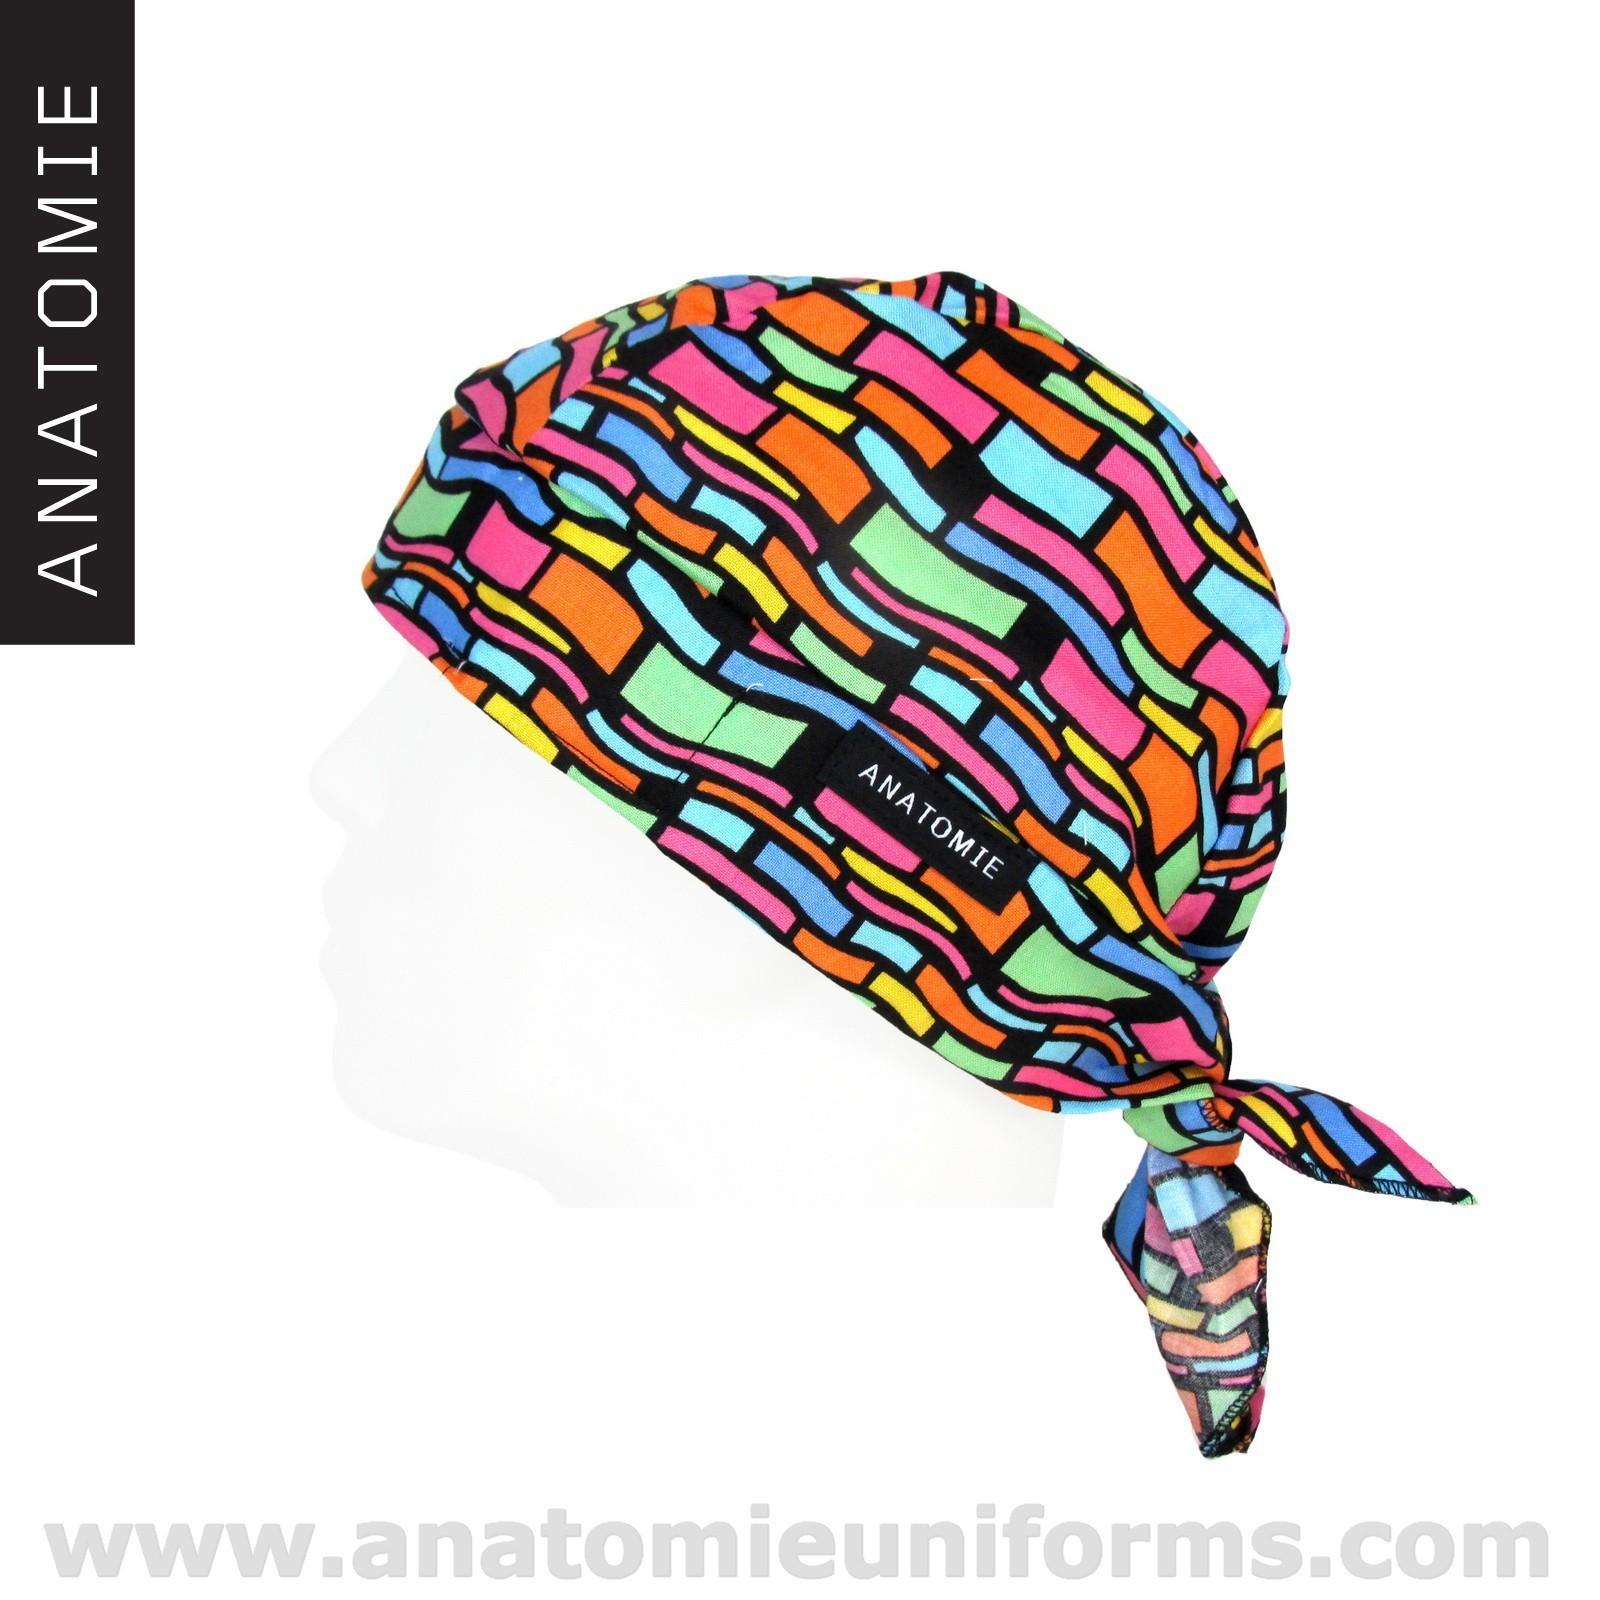 ANATOMIE BANDANA Quirofano Divertidas Colores - 018